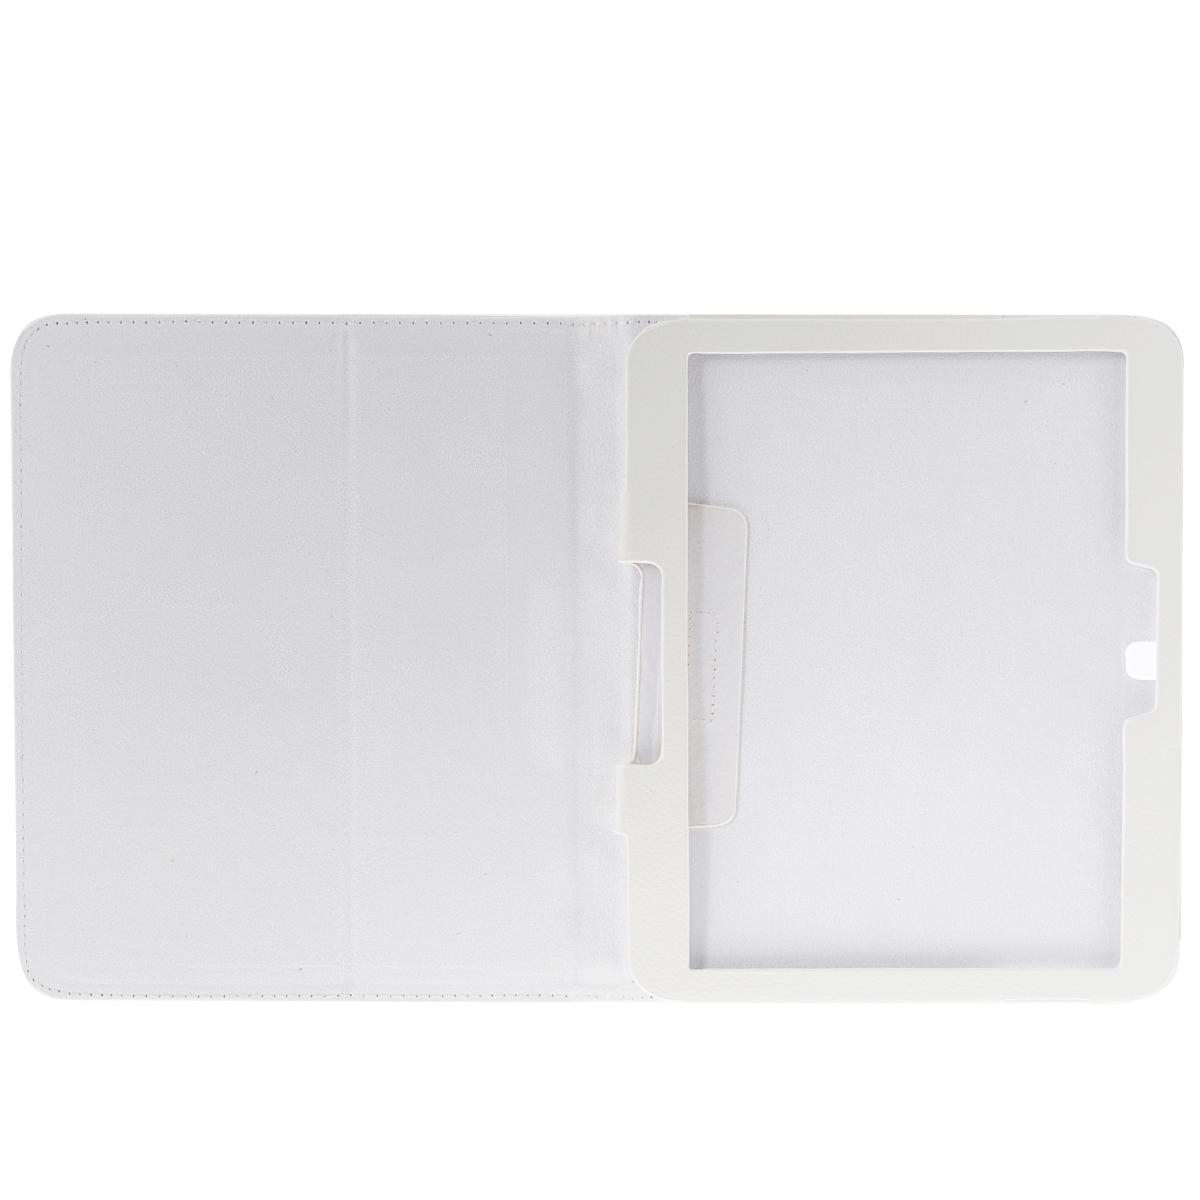 IT Baggageчехол для Samsung Galaxy Tab 4 10. 1, White IT Baggage